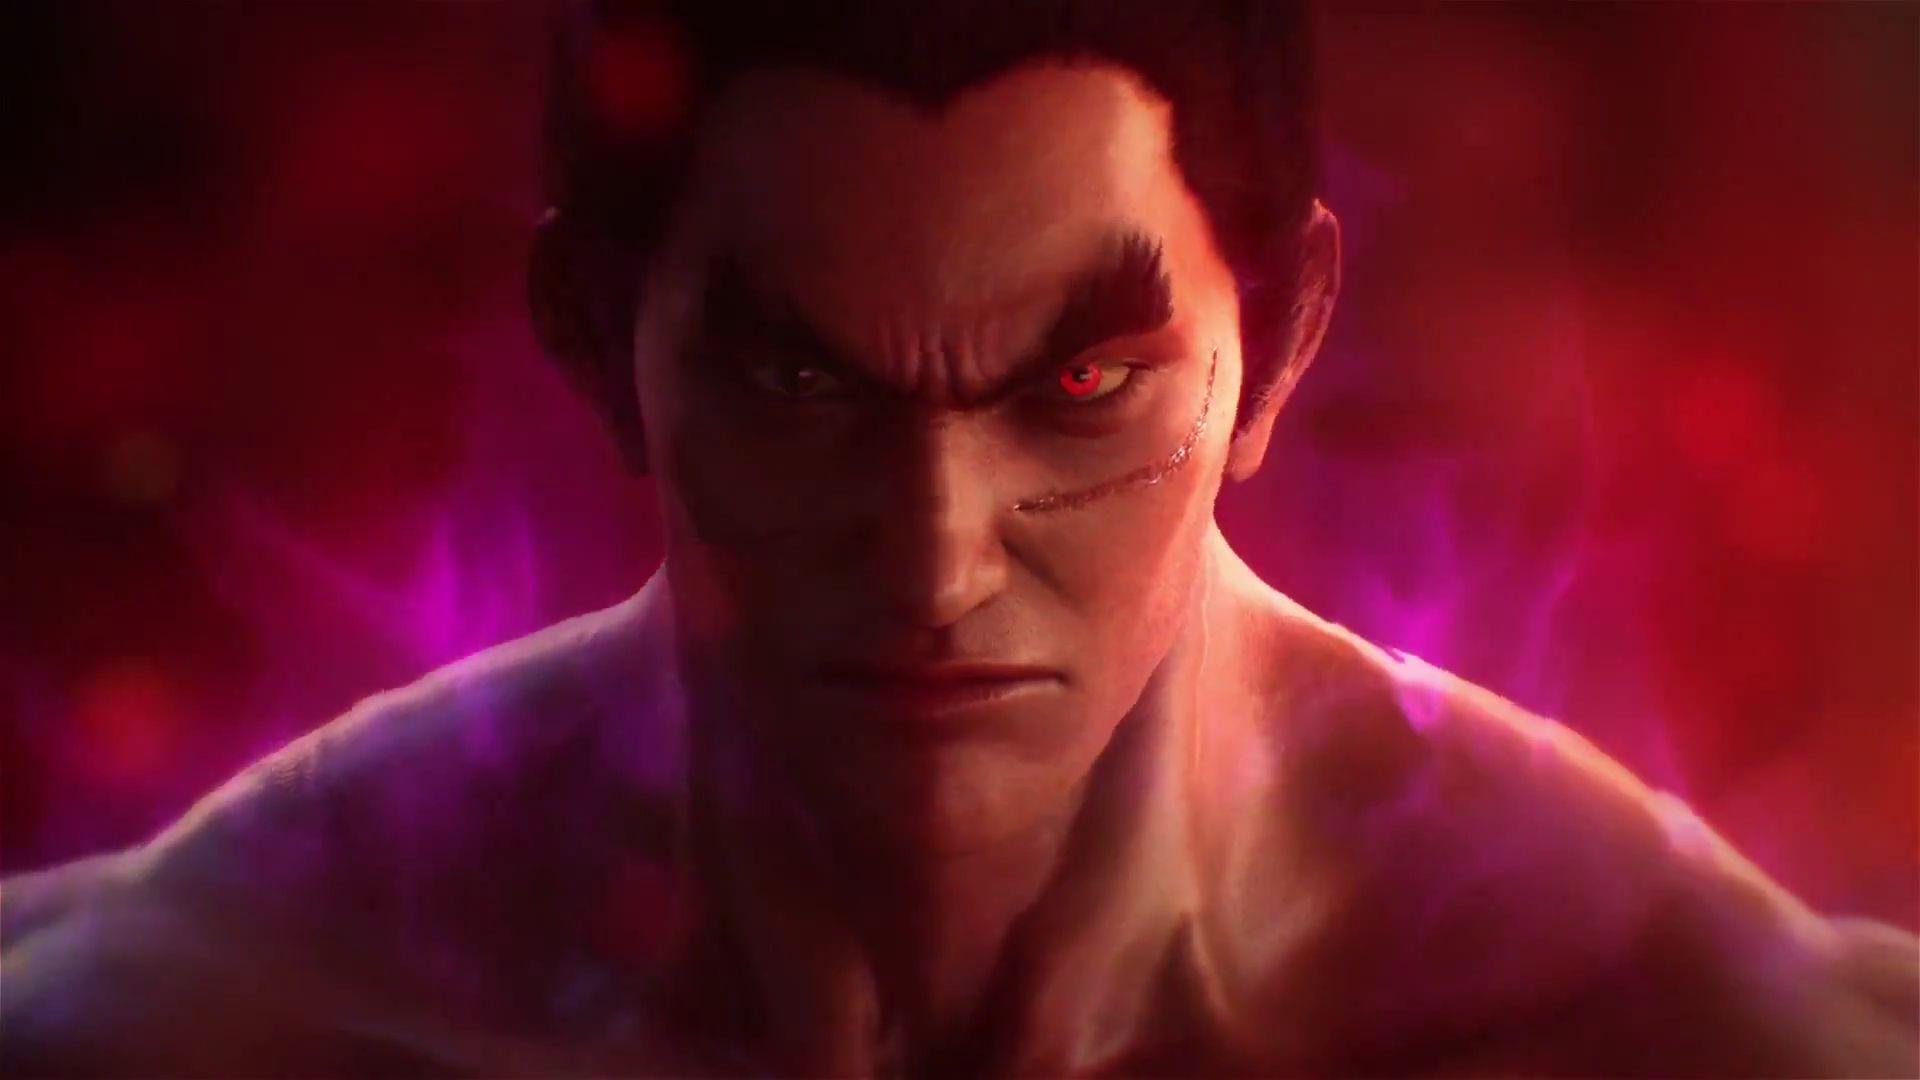 Tekken 7 Wallpapers High Quality